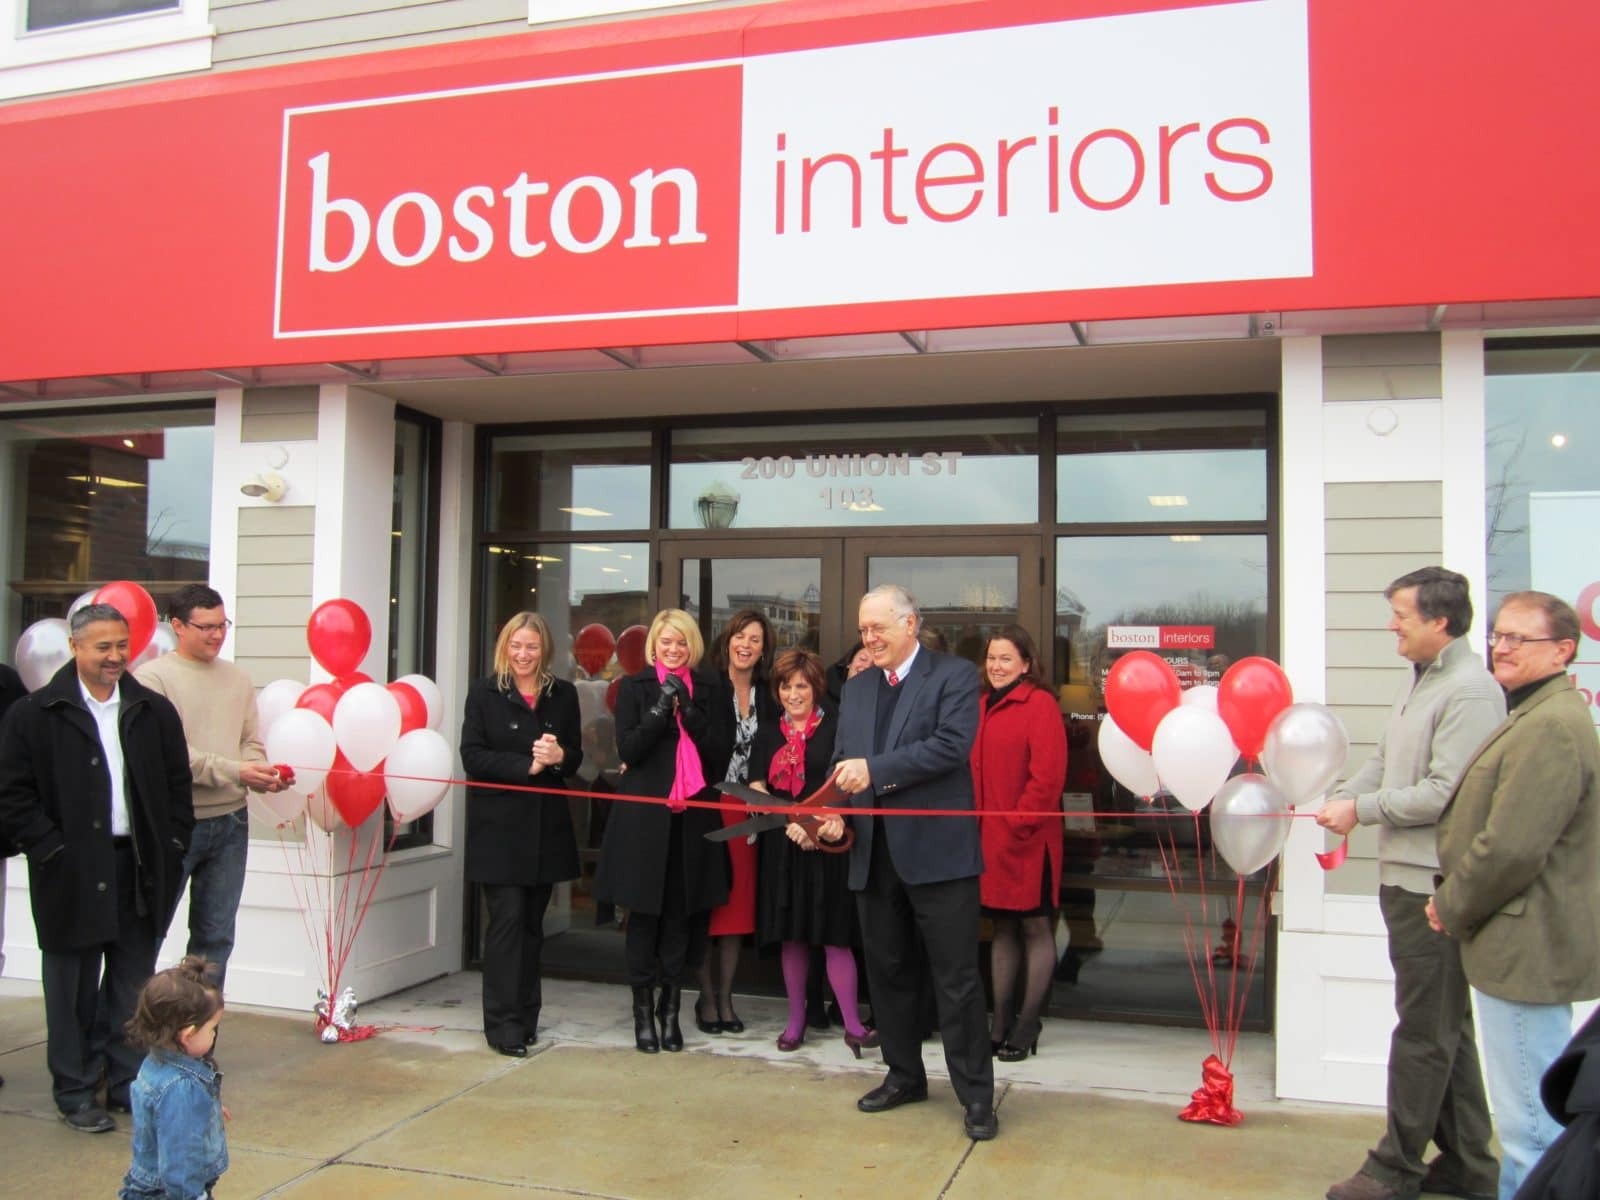 Boston Interiors Celebrates Grand Opening Of New